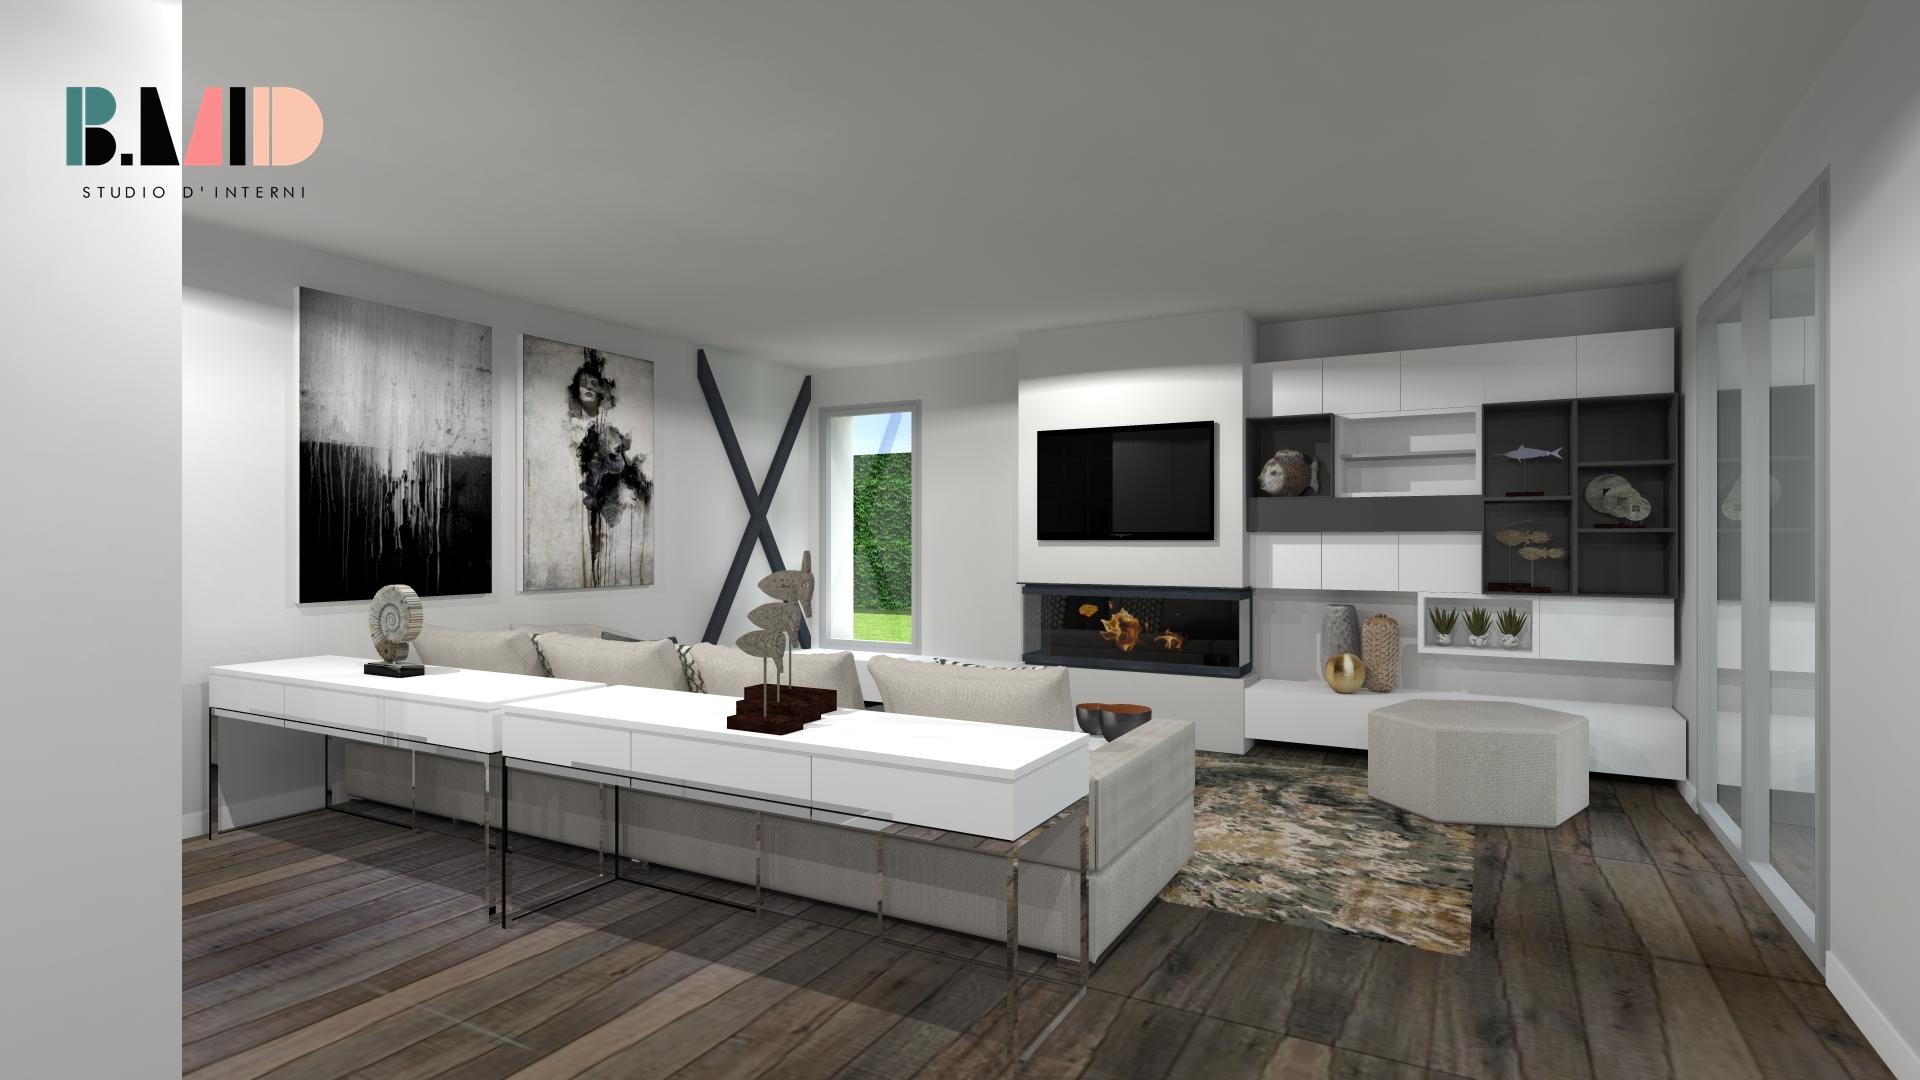 Arredamento moderno salotto con camino good soggiorno con for Salotto con camino arredamento